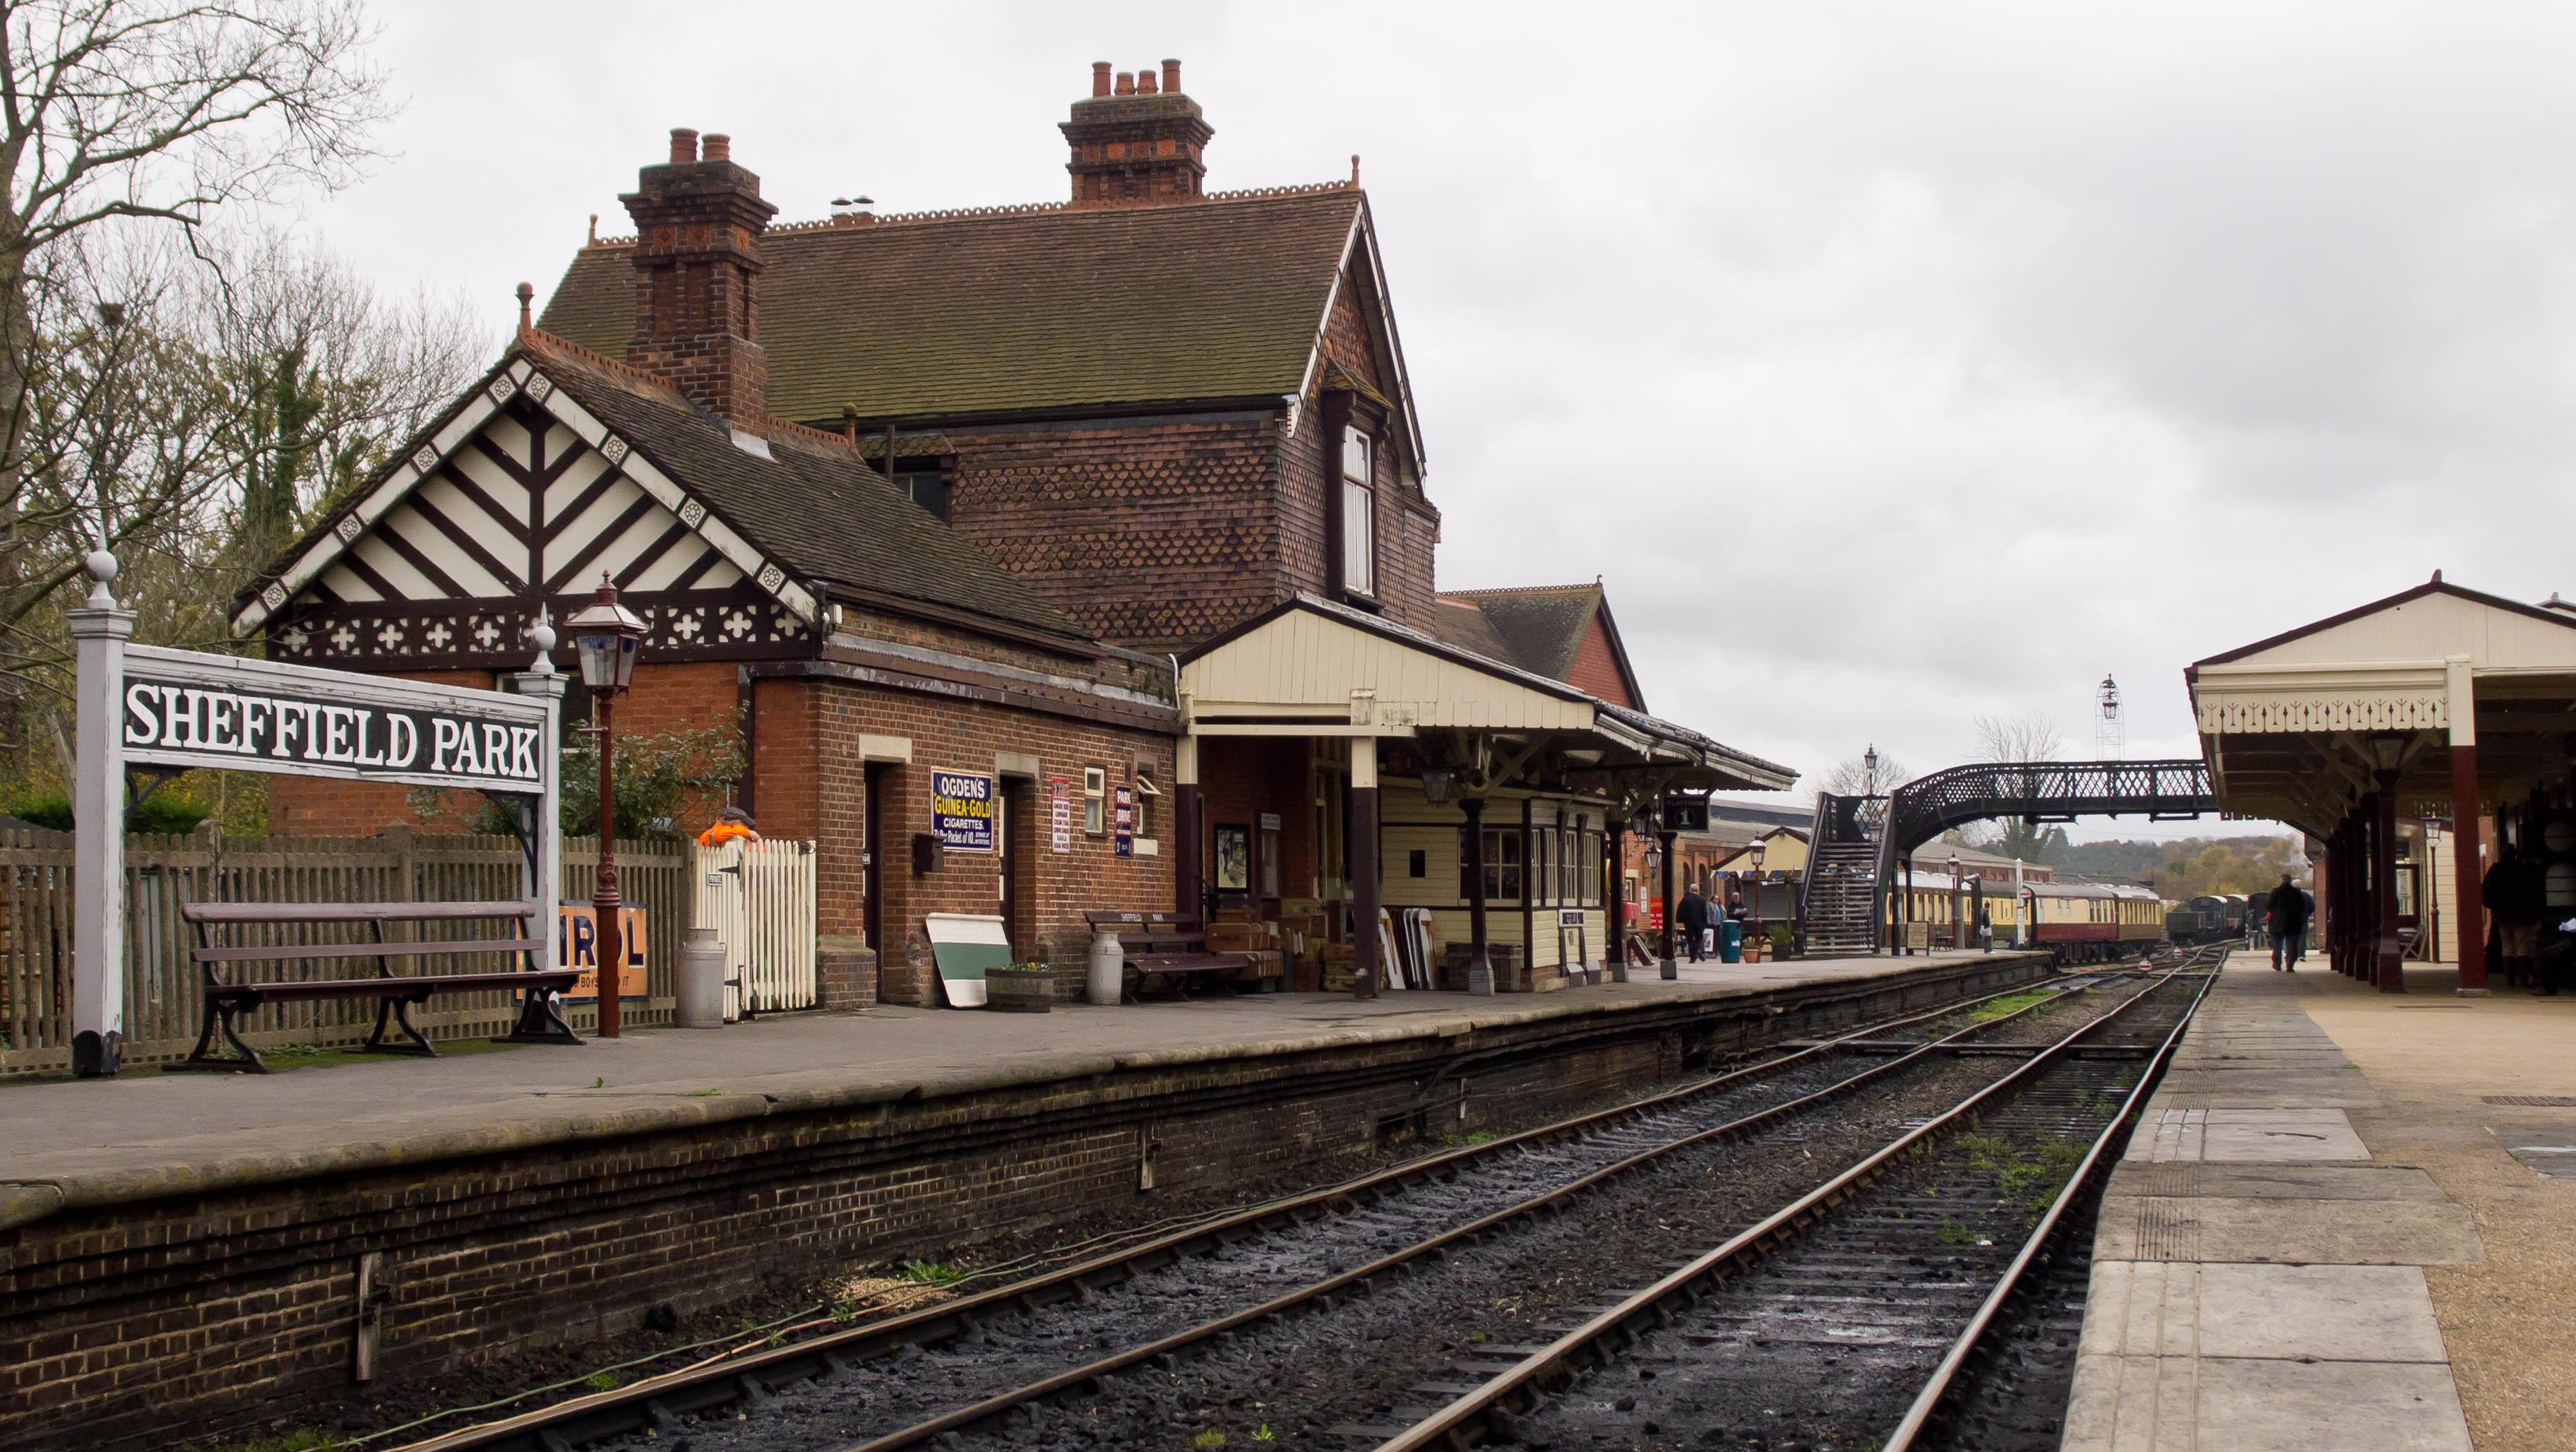 Bluebell_Railway_-_Sheffield_Park_Statio